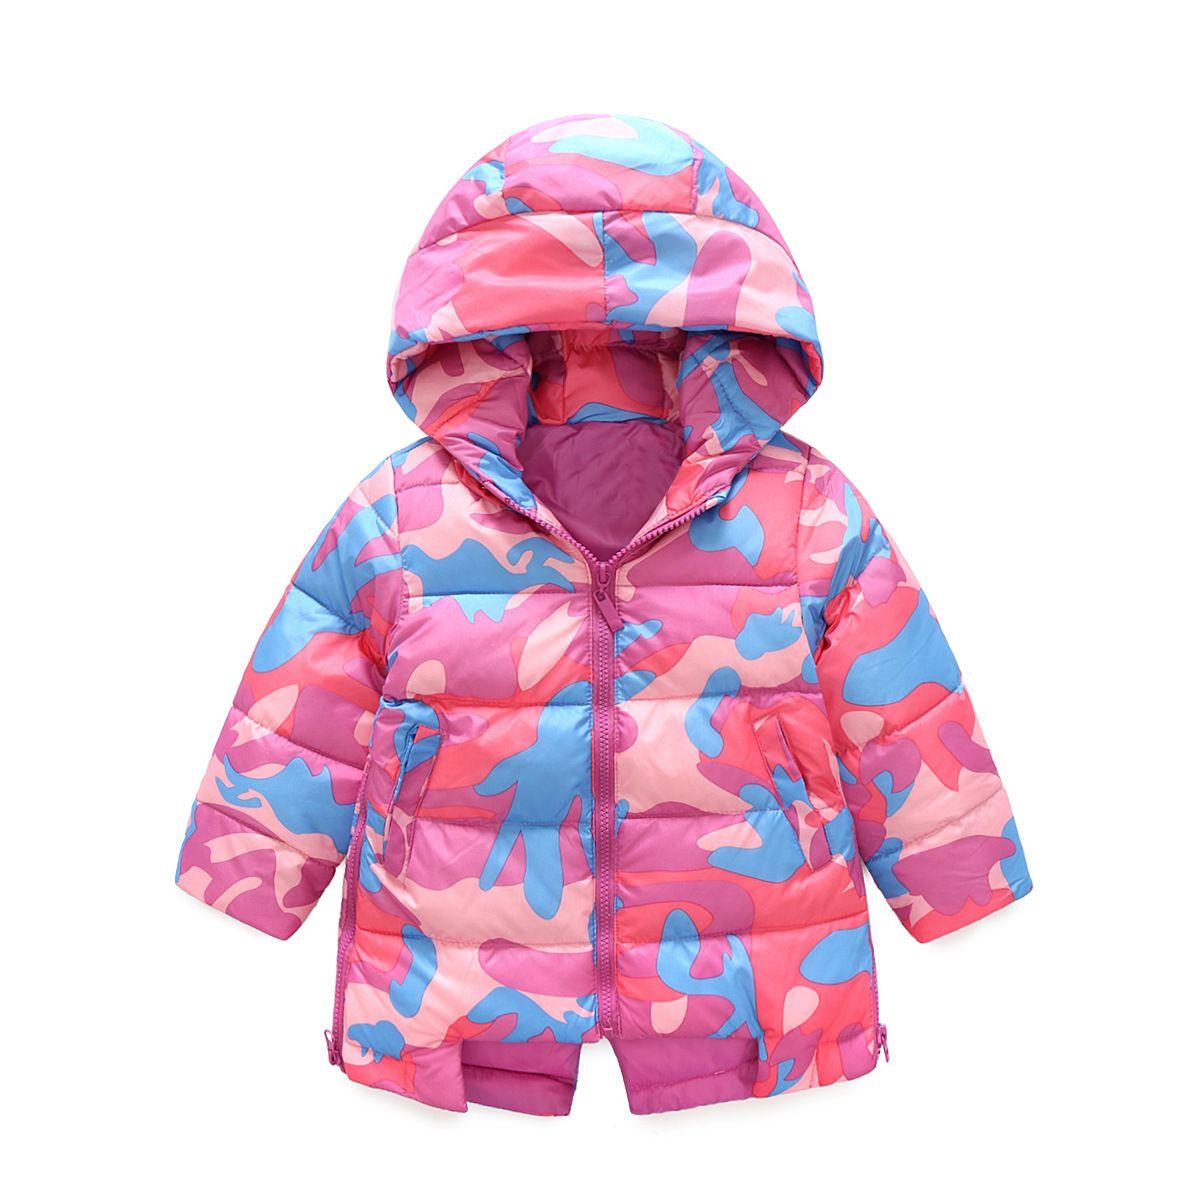 6fcc99306 2017 Winter Baby Girls Coats Outwear Fashion Children Long Sleeve ...